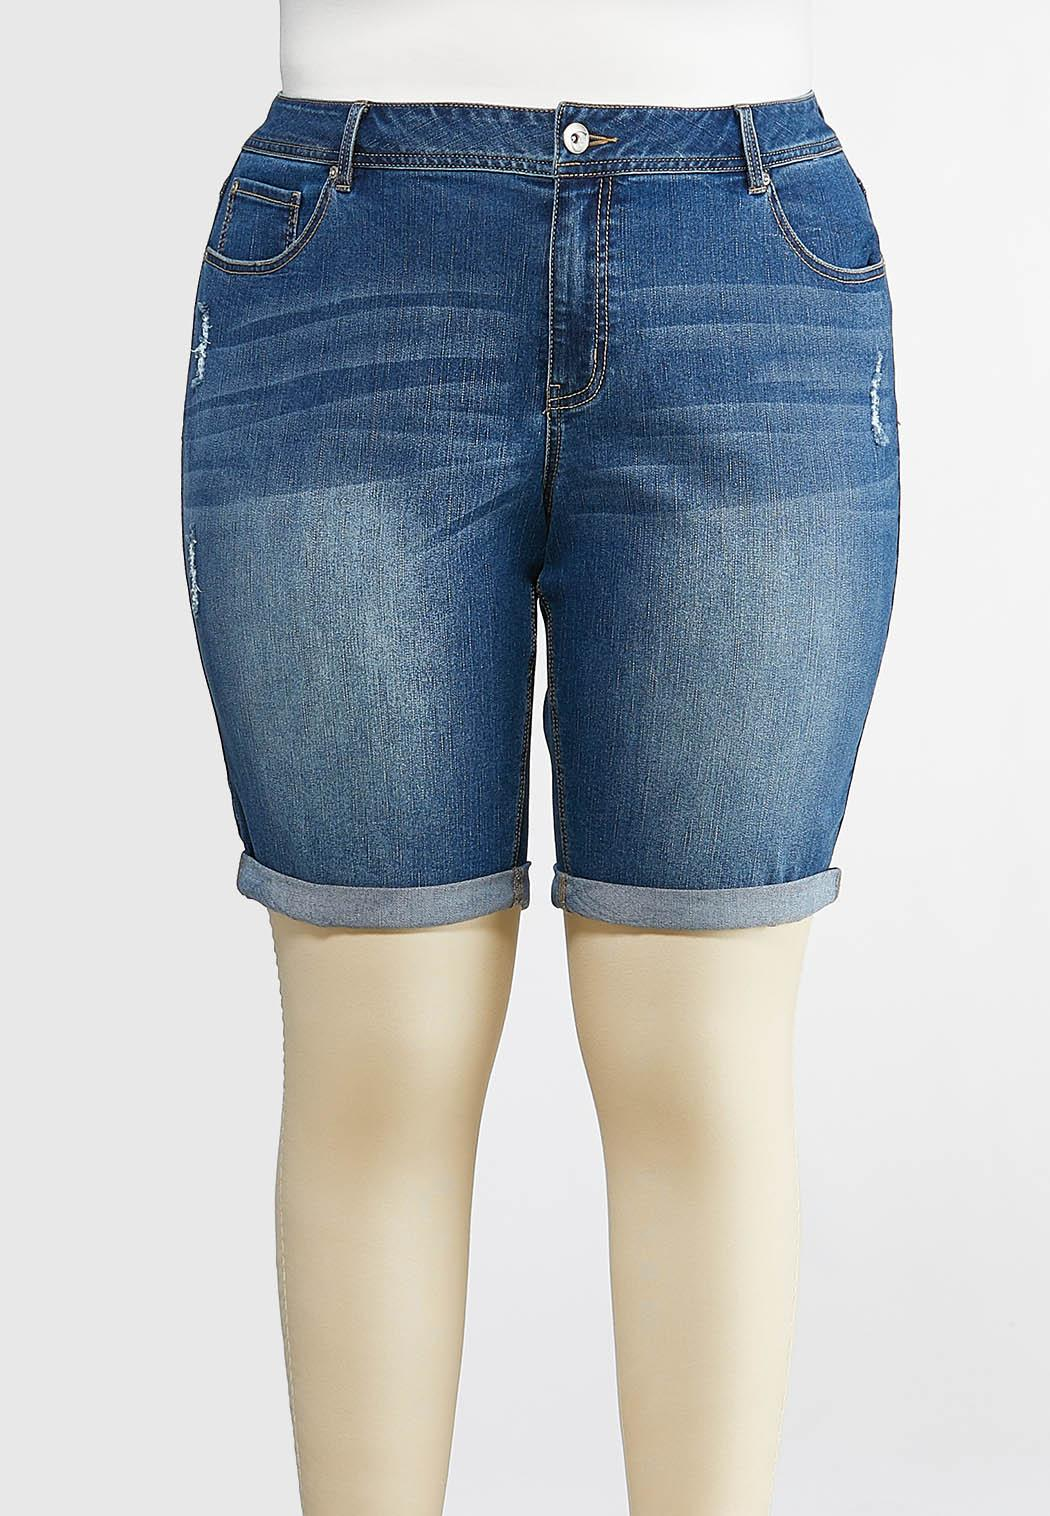 e847a22178 Plus Size Distressed Denim Bermuda Shorts Shorts Cato Fashions